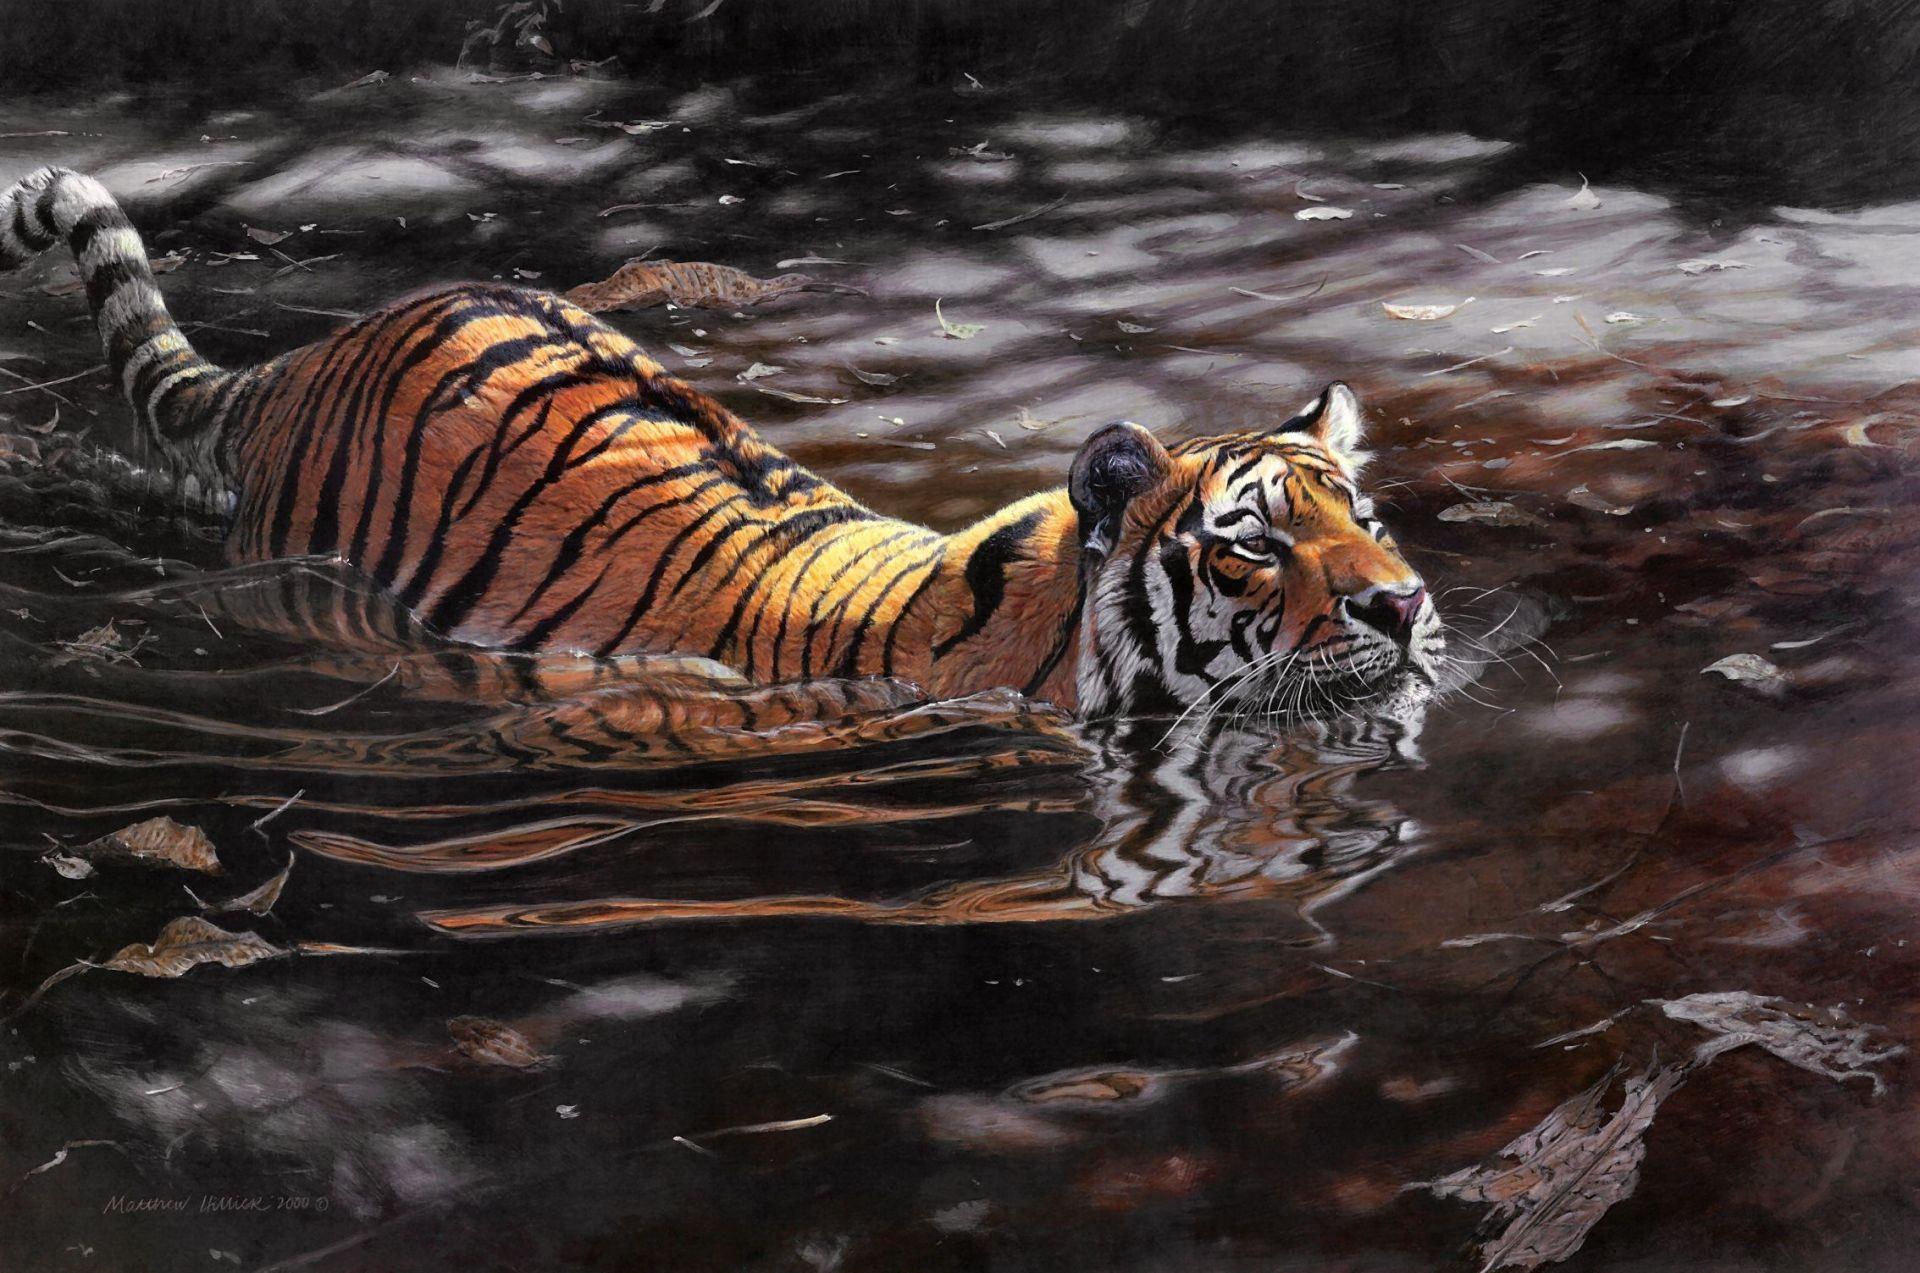 Tiger Swiming Art, Wallpaper